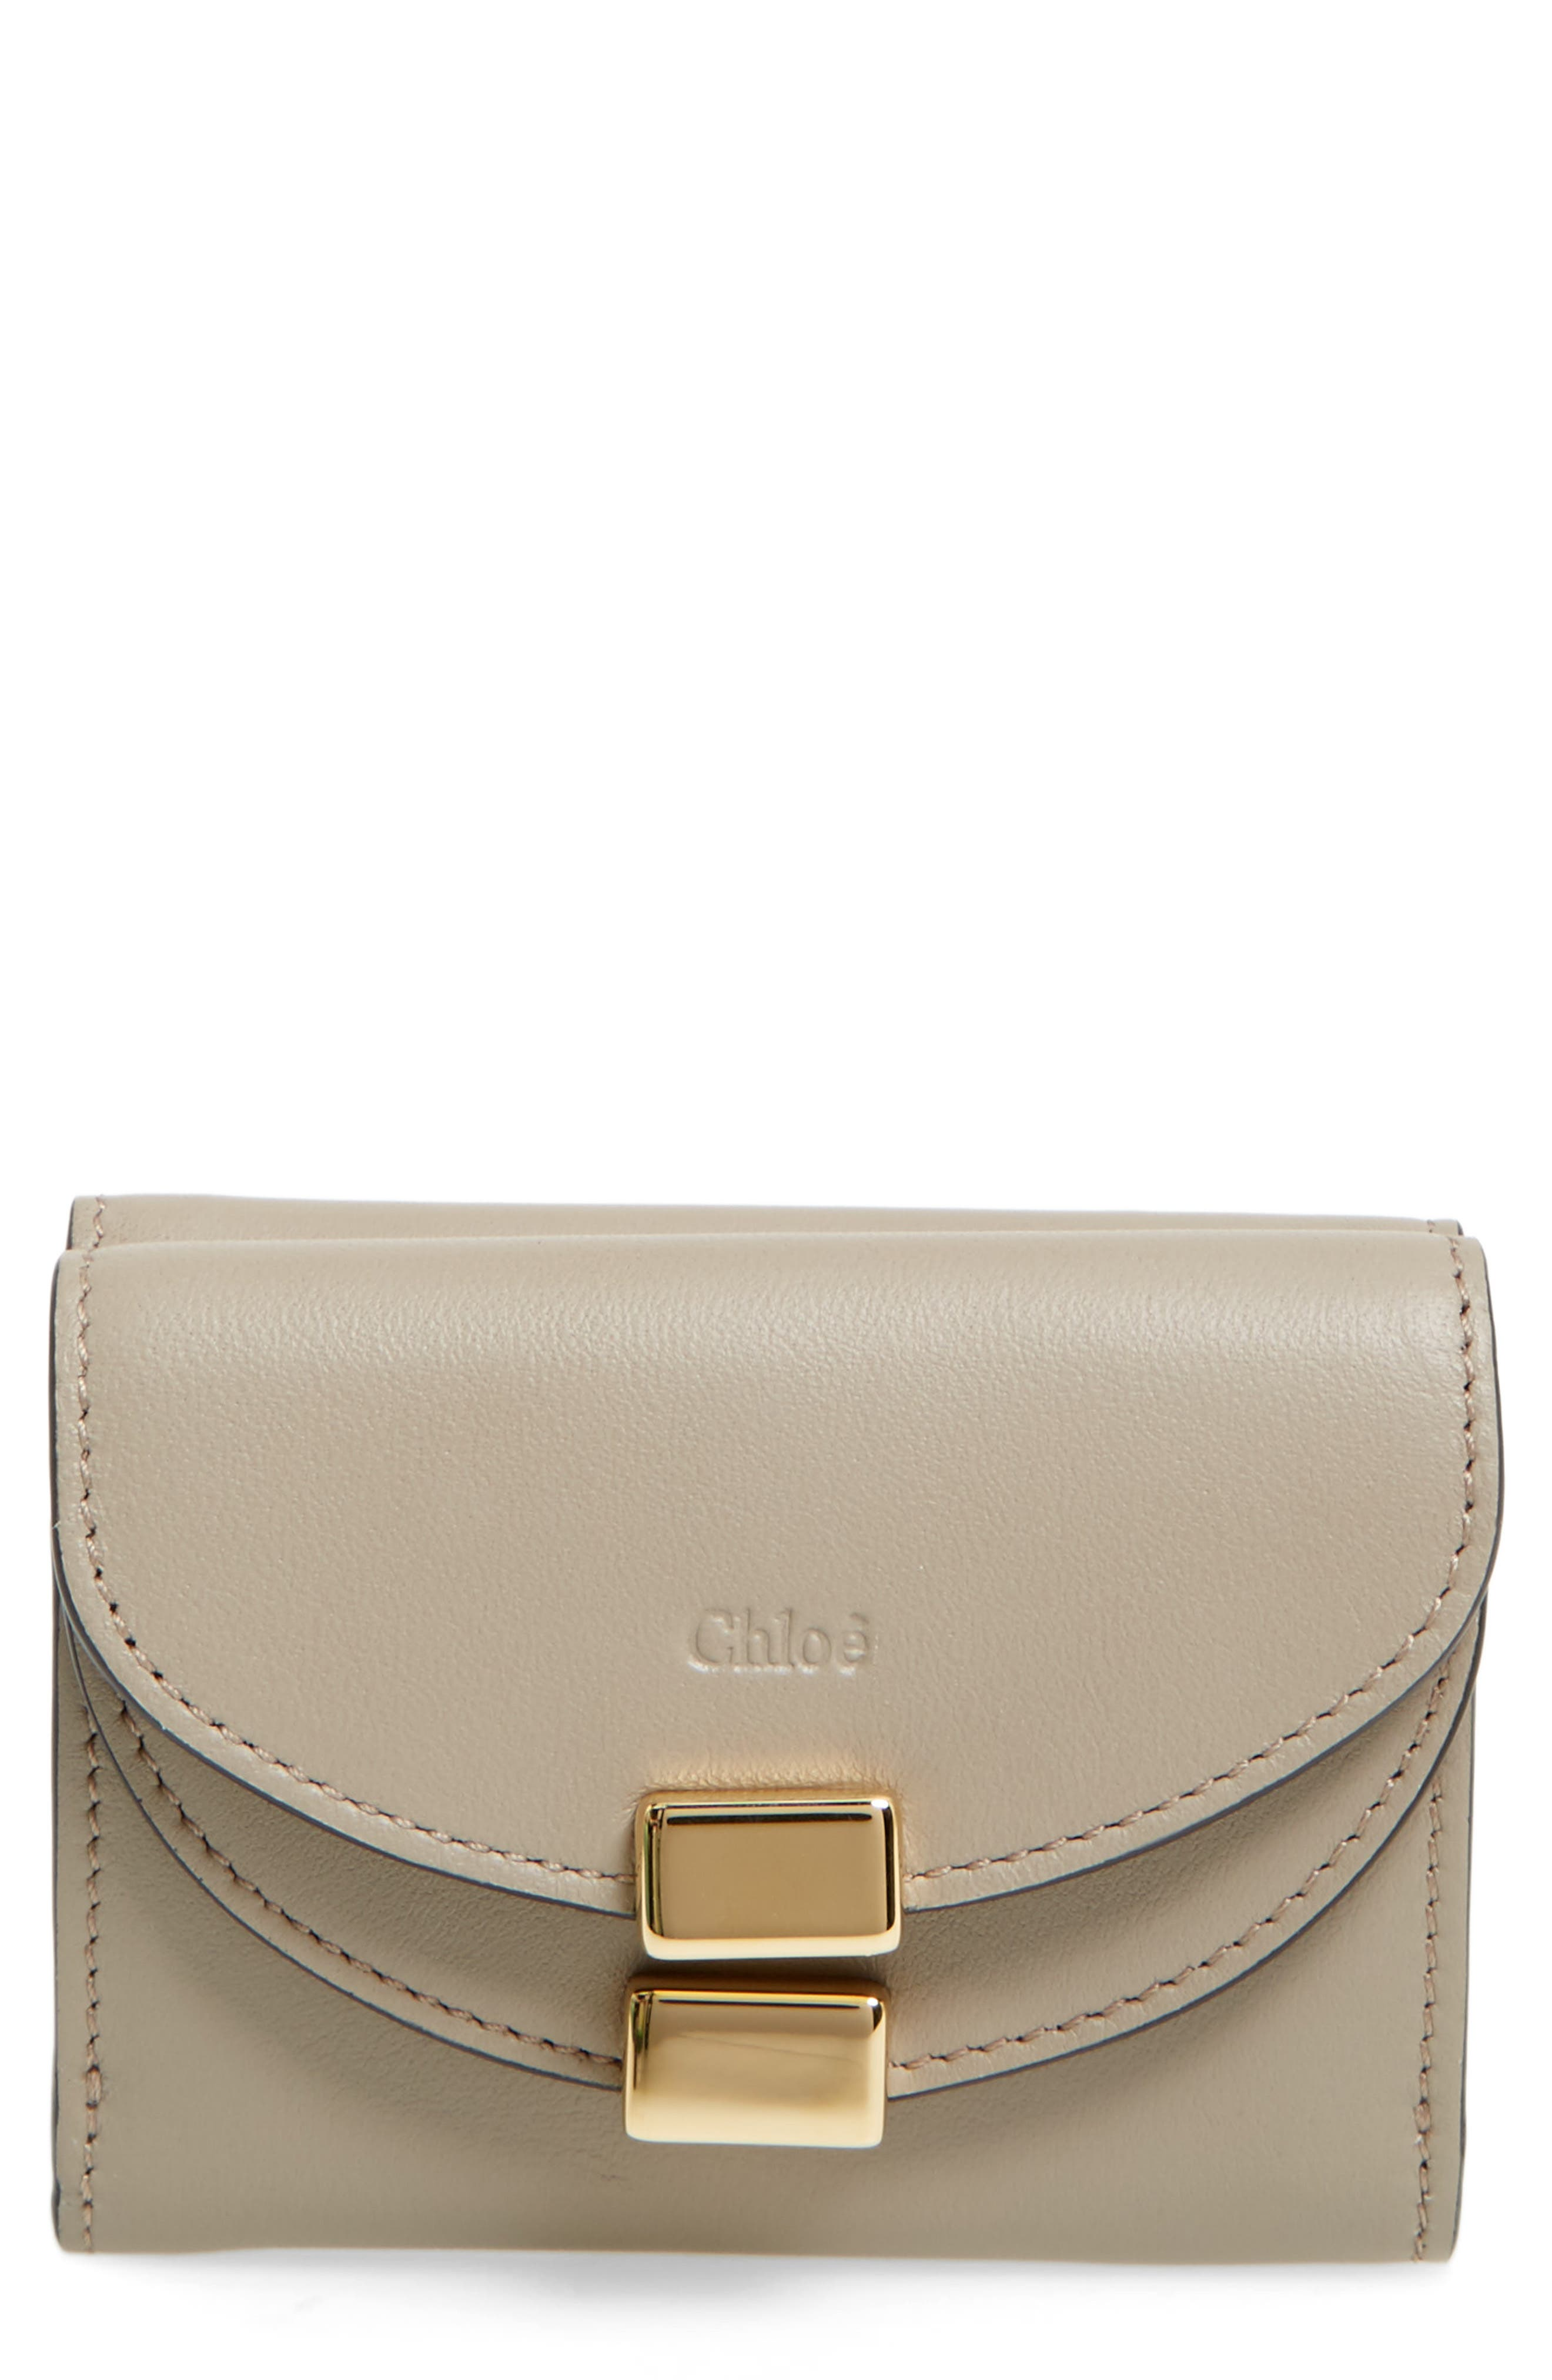 Chloé Mini Georgia Calfskin Trifold Wallet